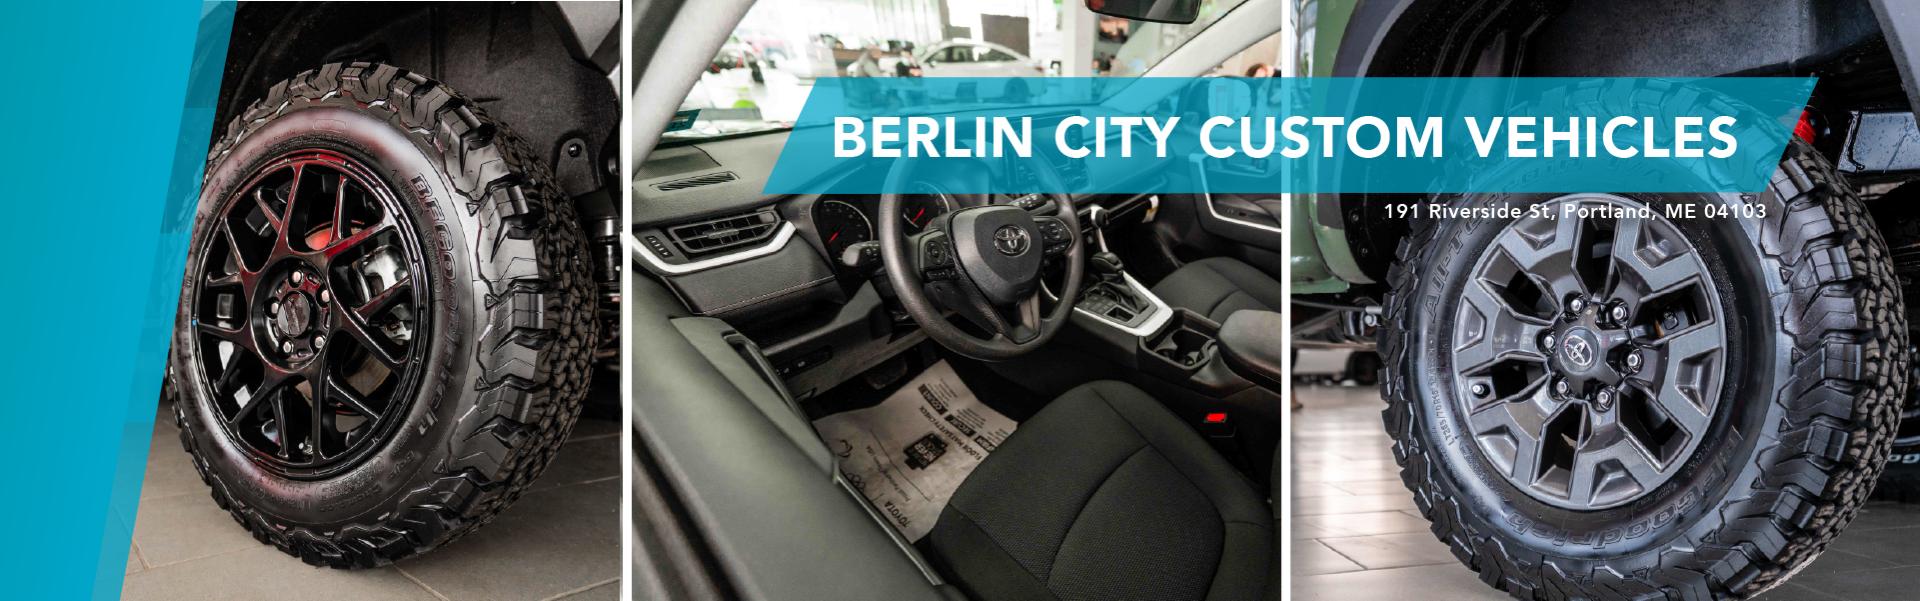 Berlin-City-custom-vehicles banner